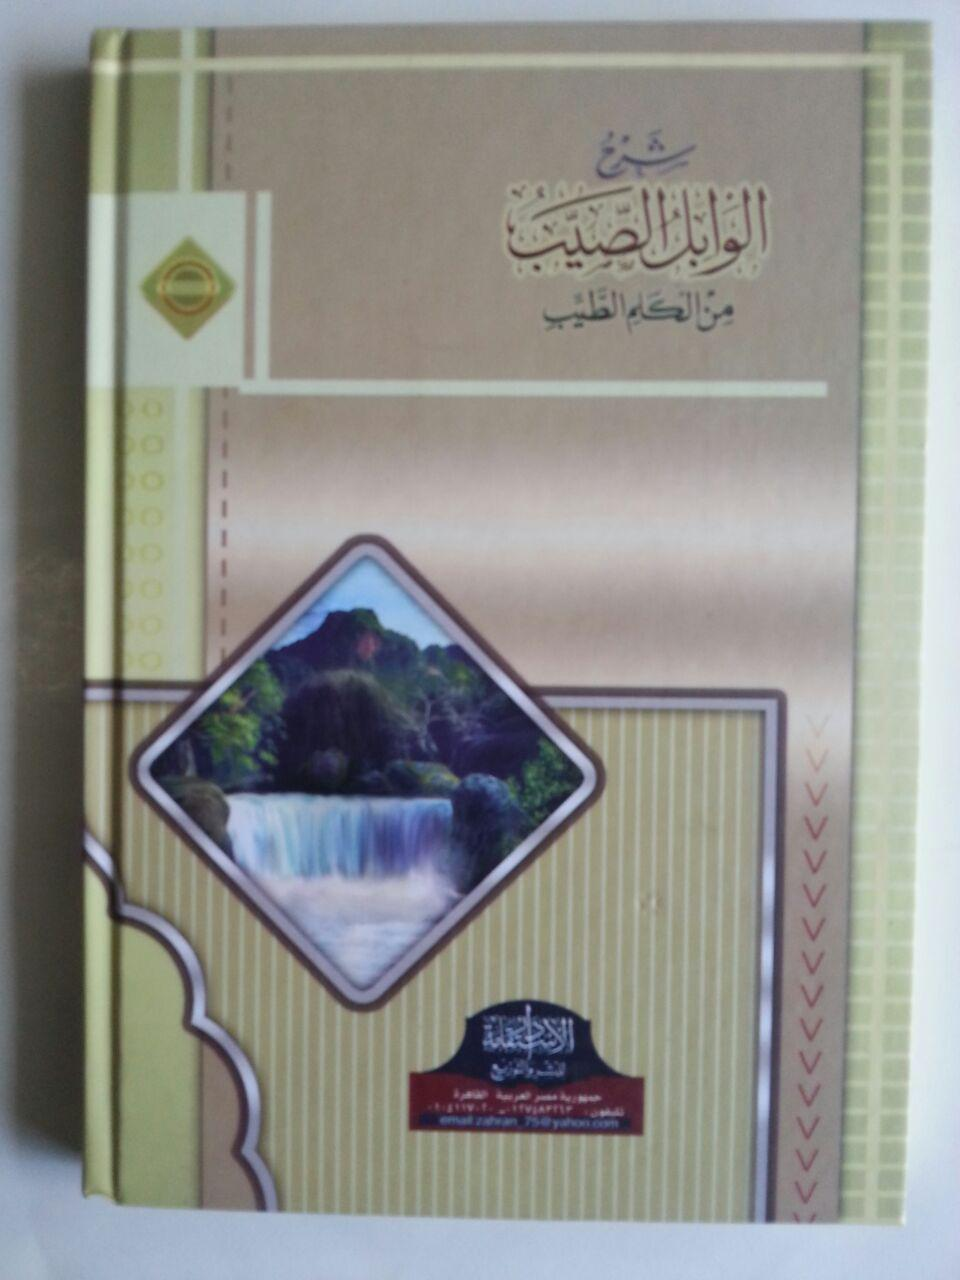 Kitab Syarh Al-Wabil Ash-Shayyib Min Kalam Ath-Thayyib cover